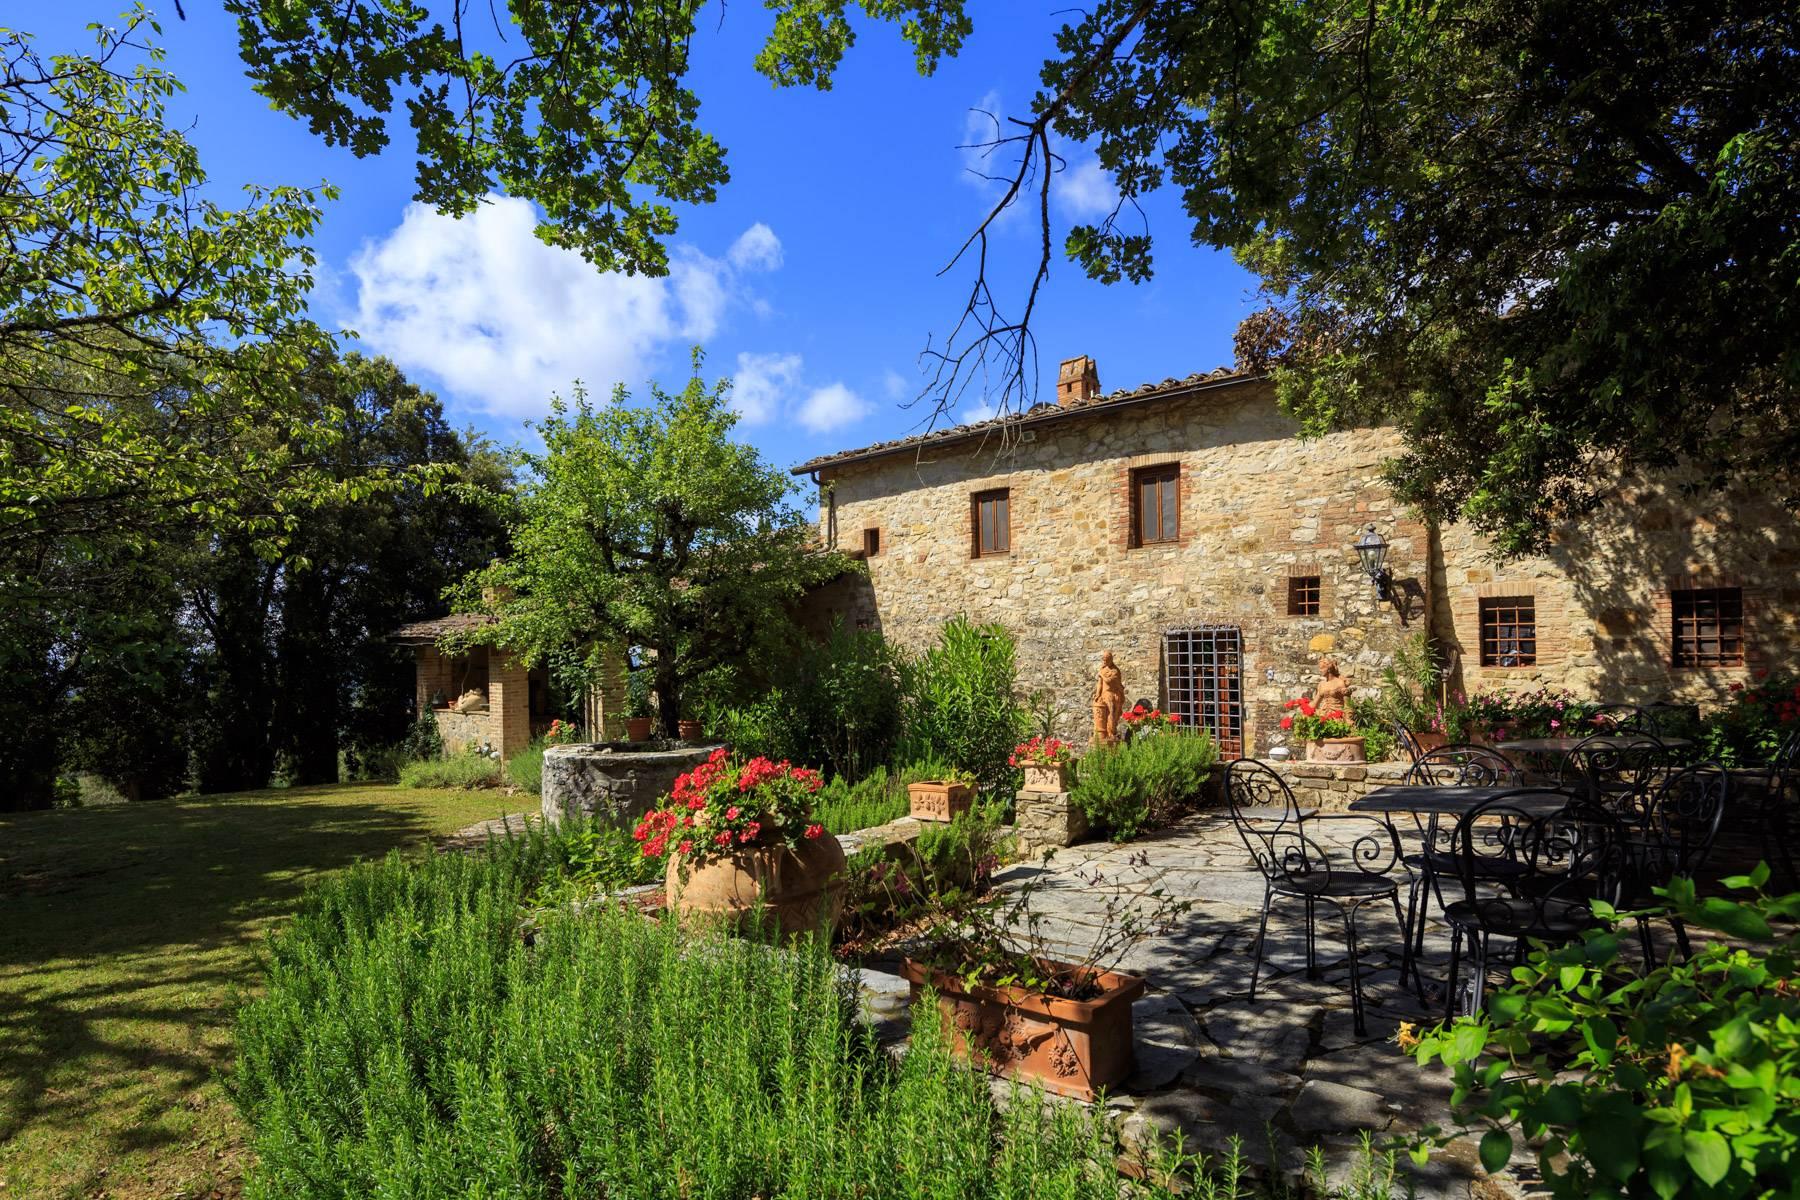 Villa in Vendita a Gaiole In Chianti: 5 locali, 465 mq - Foto 15